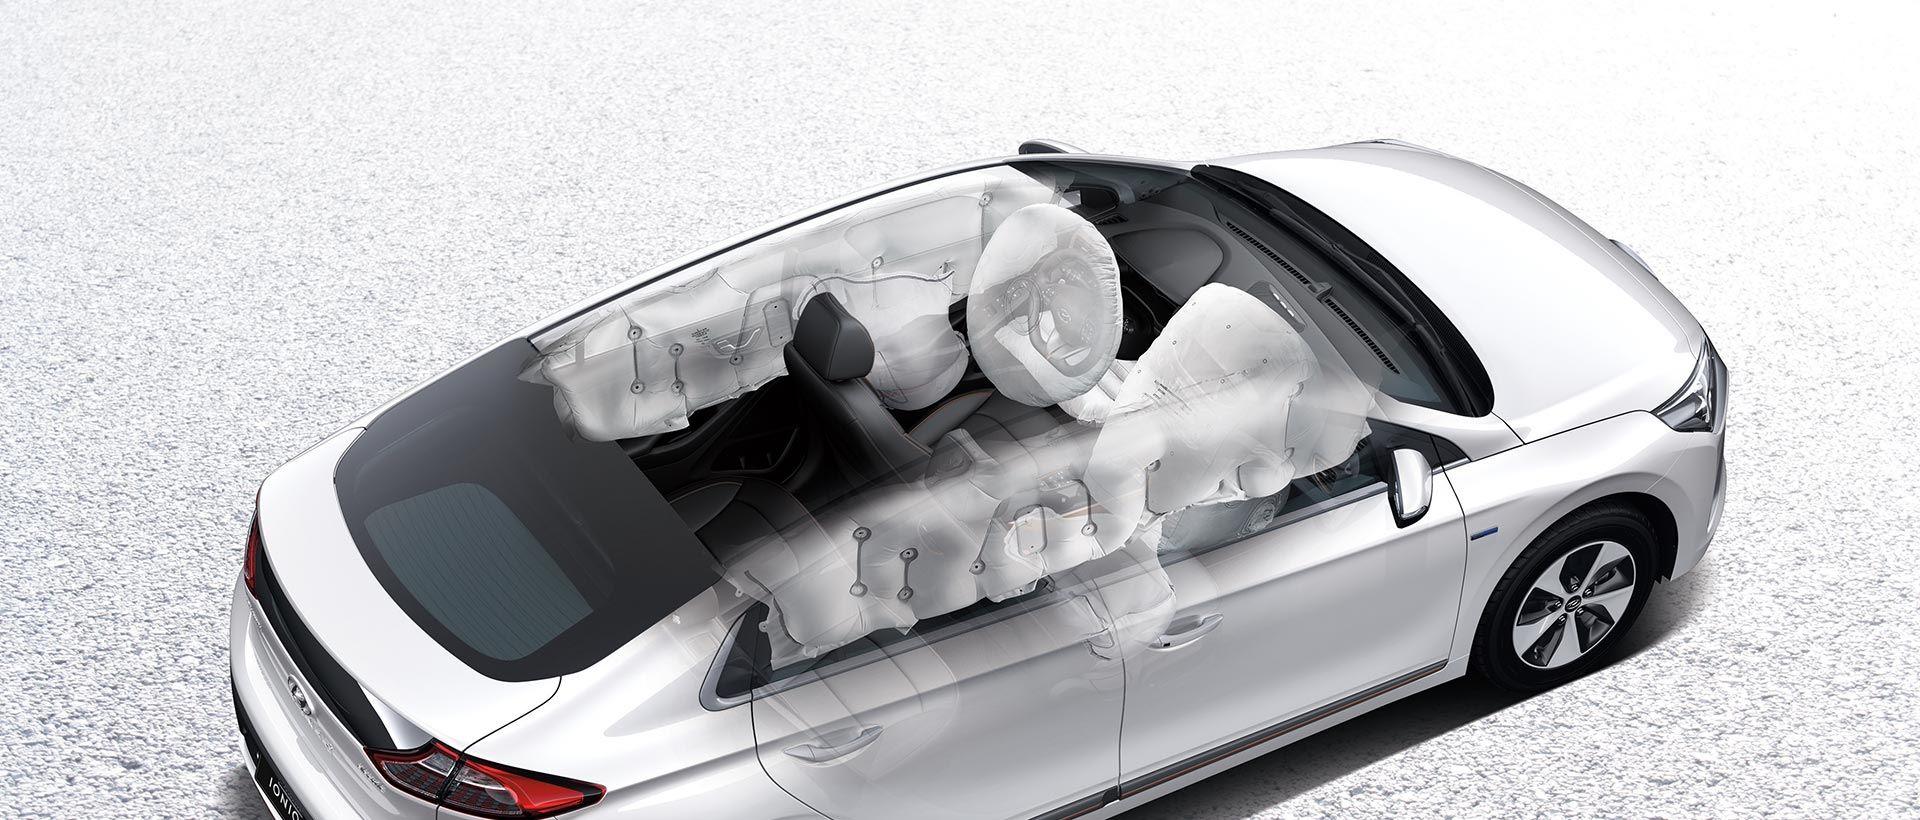 Hyundai IONIQ plug-in hybrid syv airbags